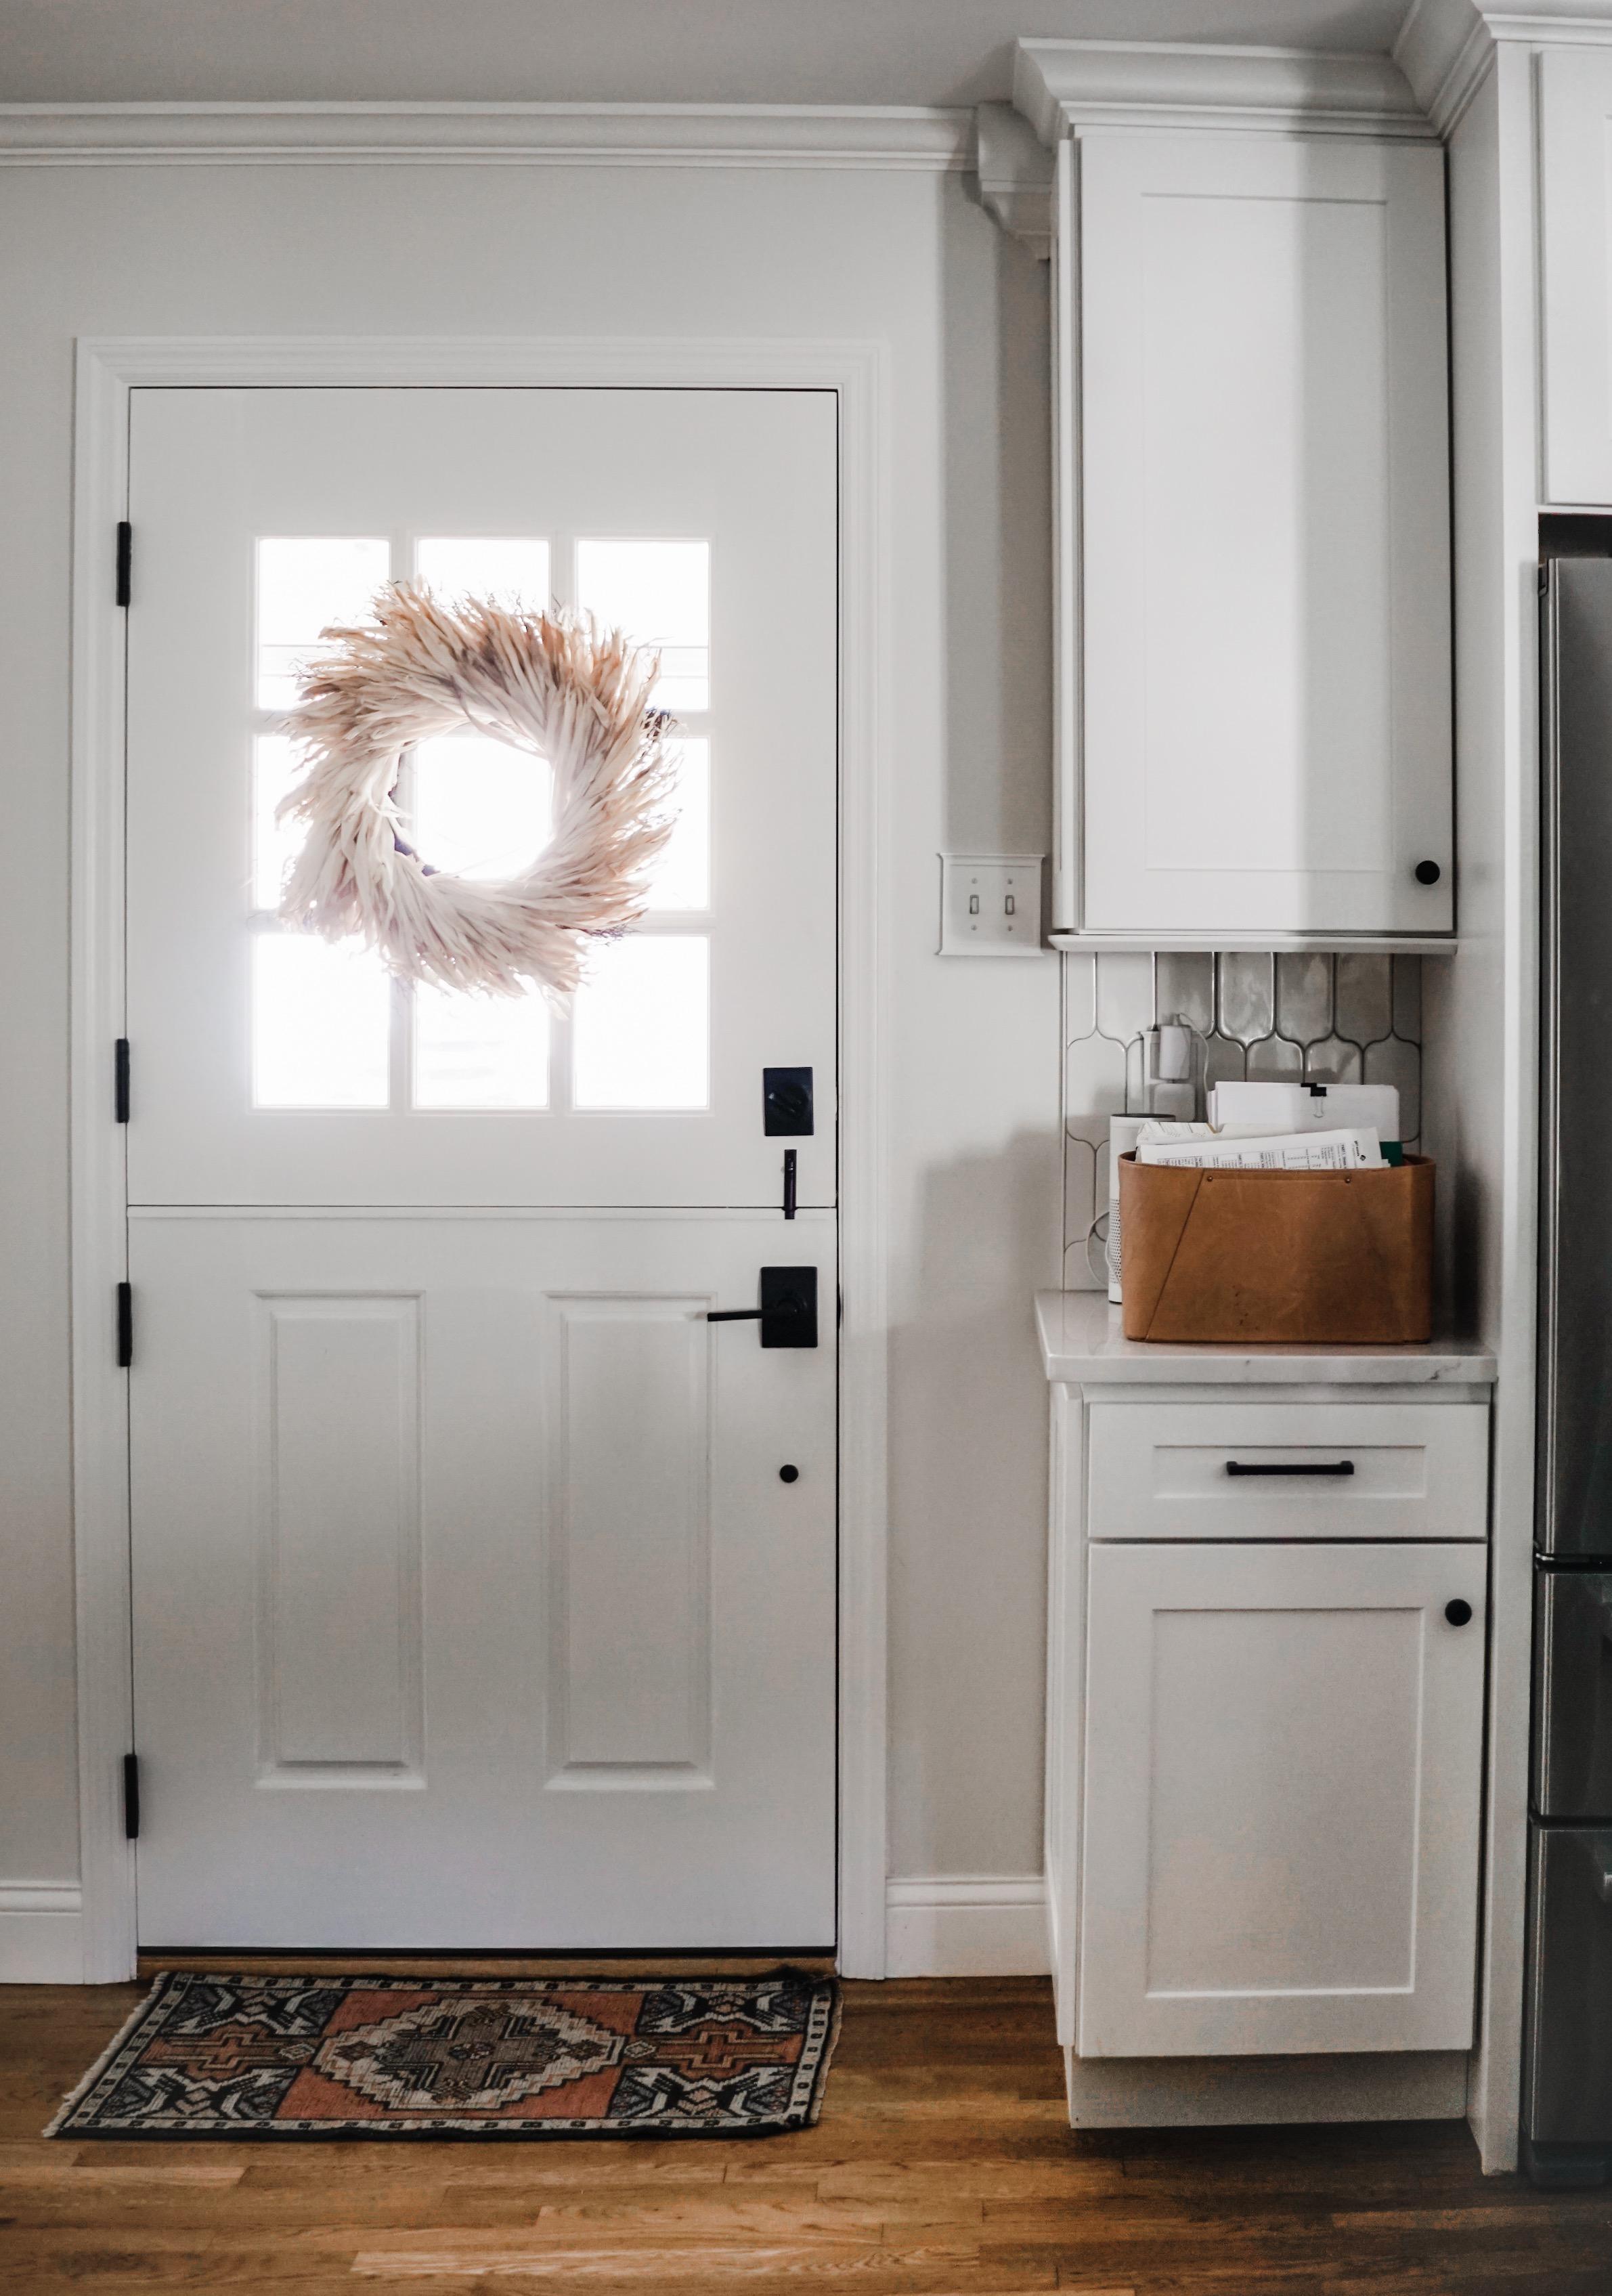 fall decor inspiration - Check out this wheat wreath // fall kitchen decor idea